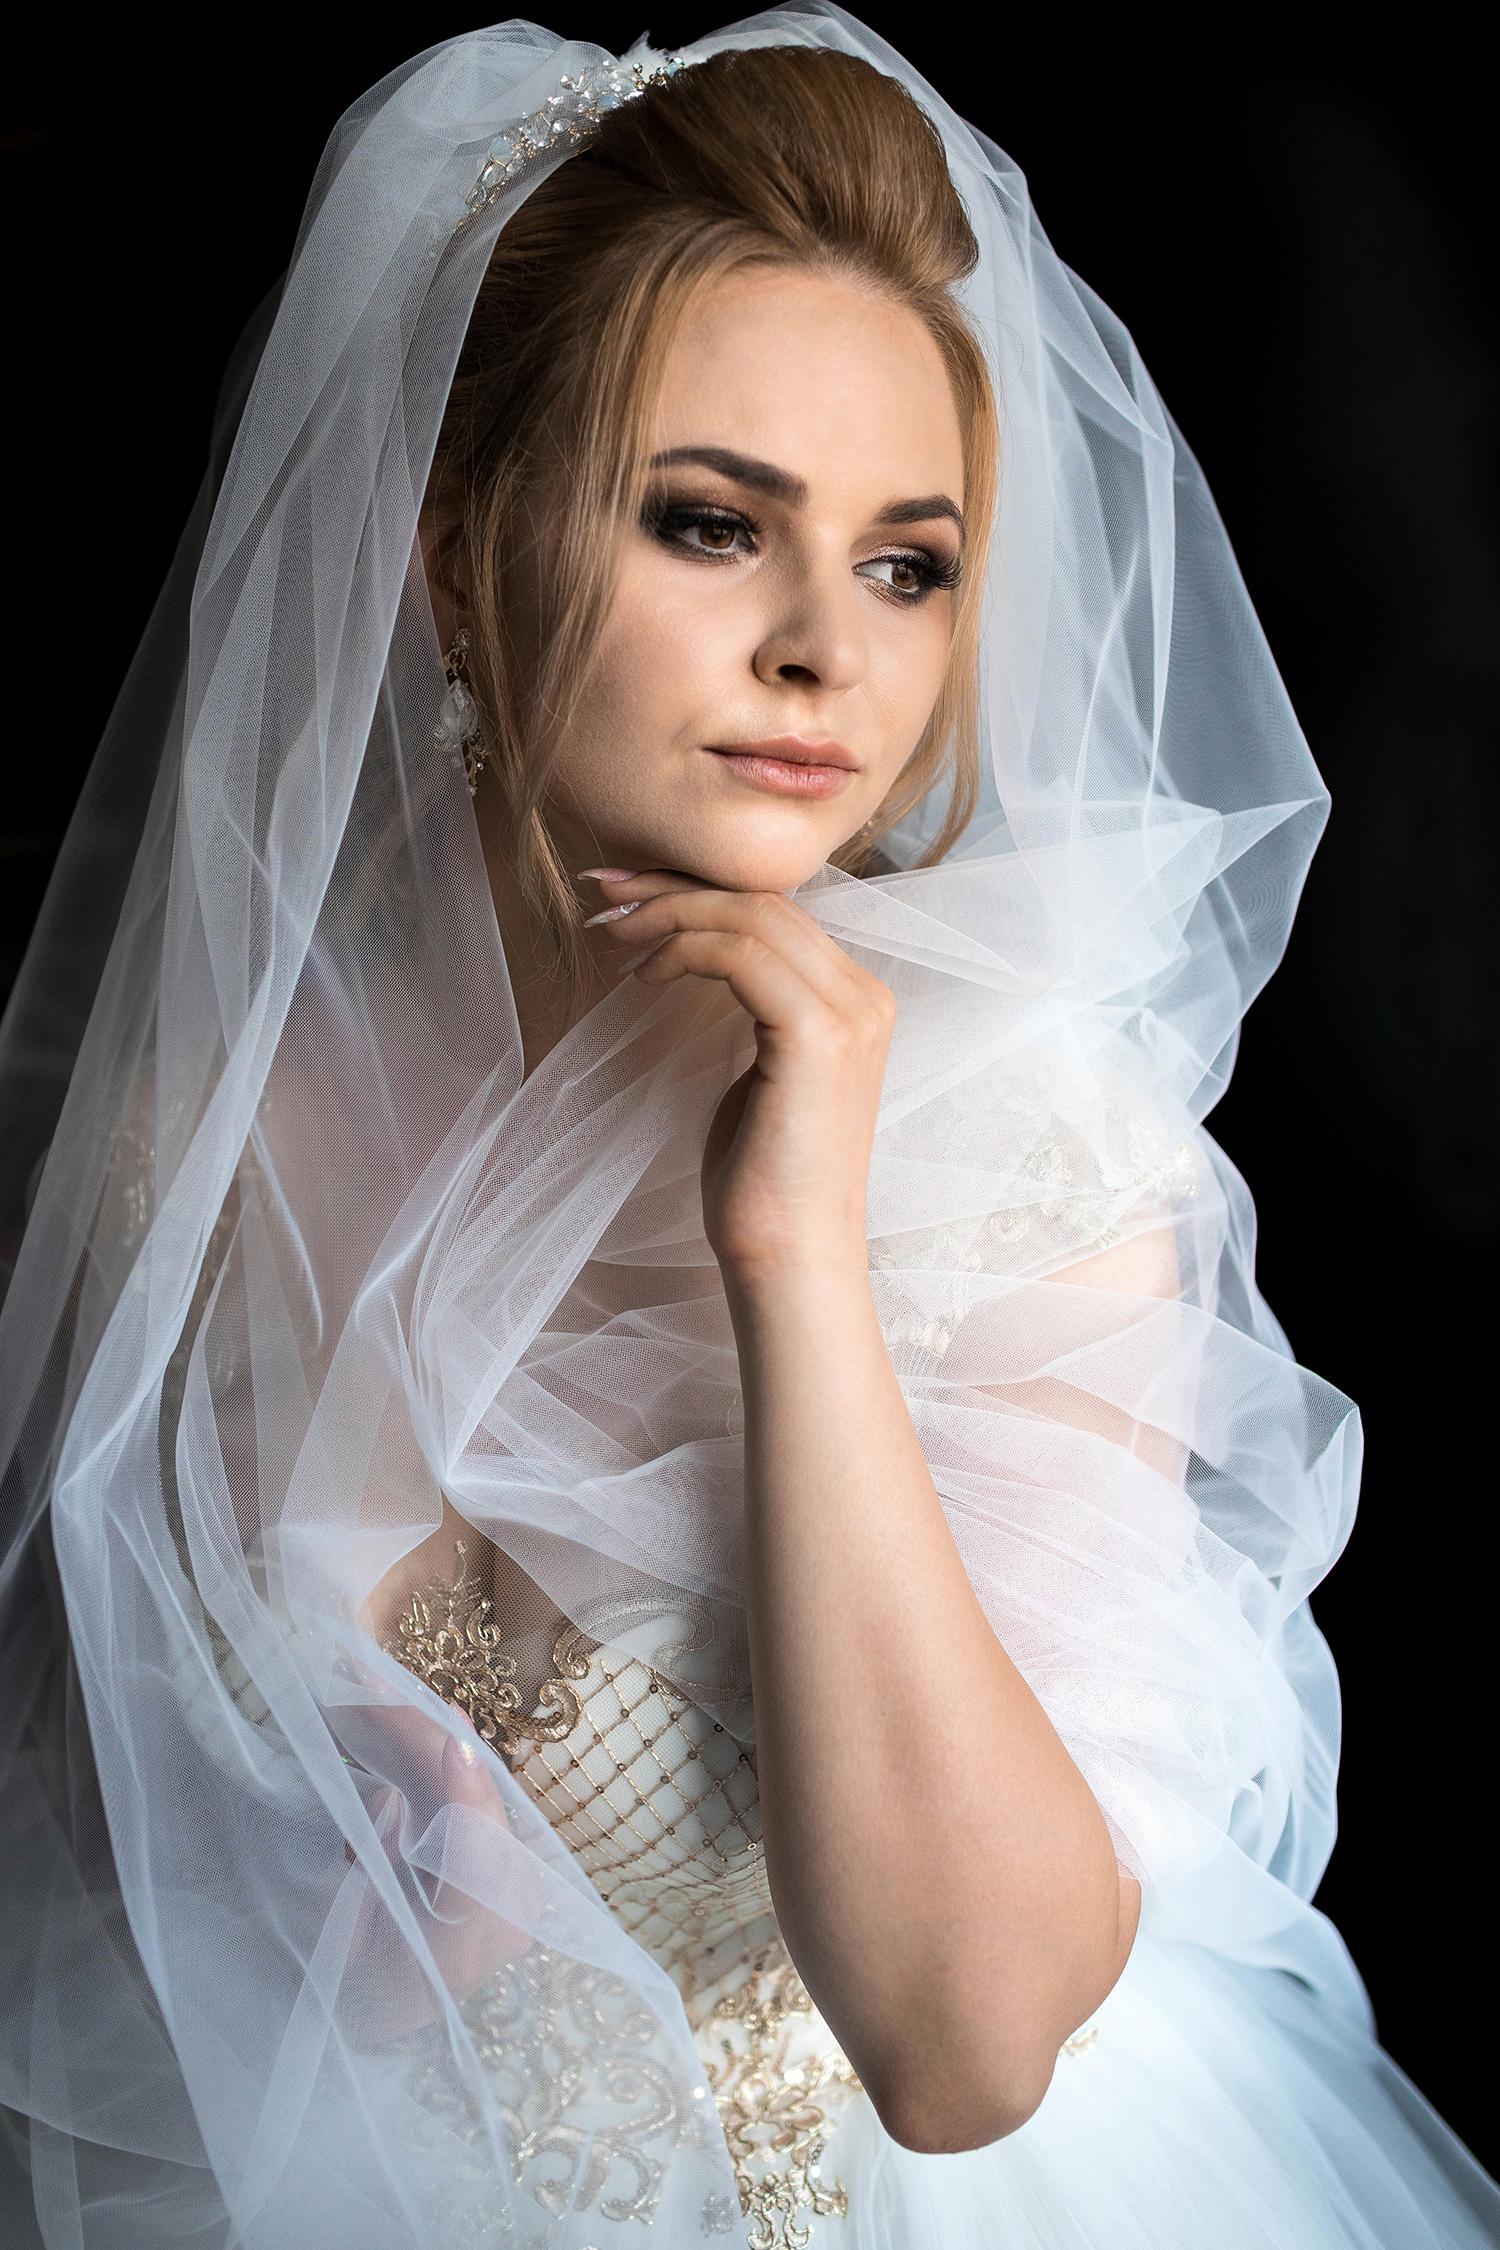 fotograf nunta iasi simona cosmin 04 1.jpg?scale.width=687&scale